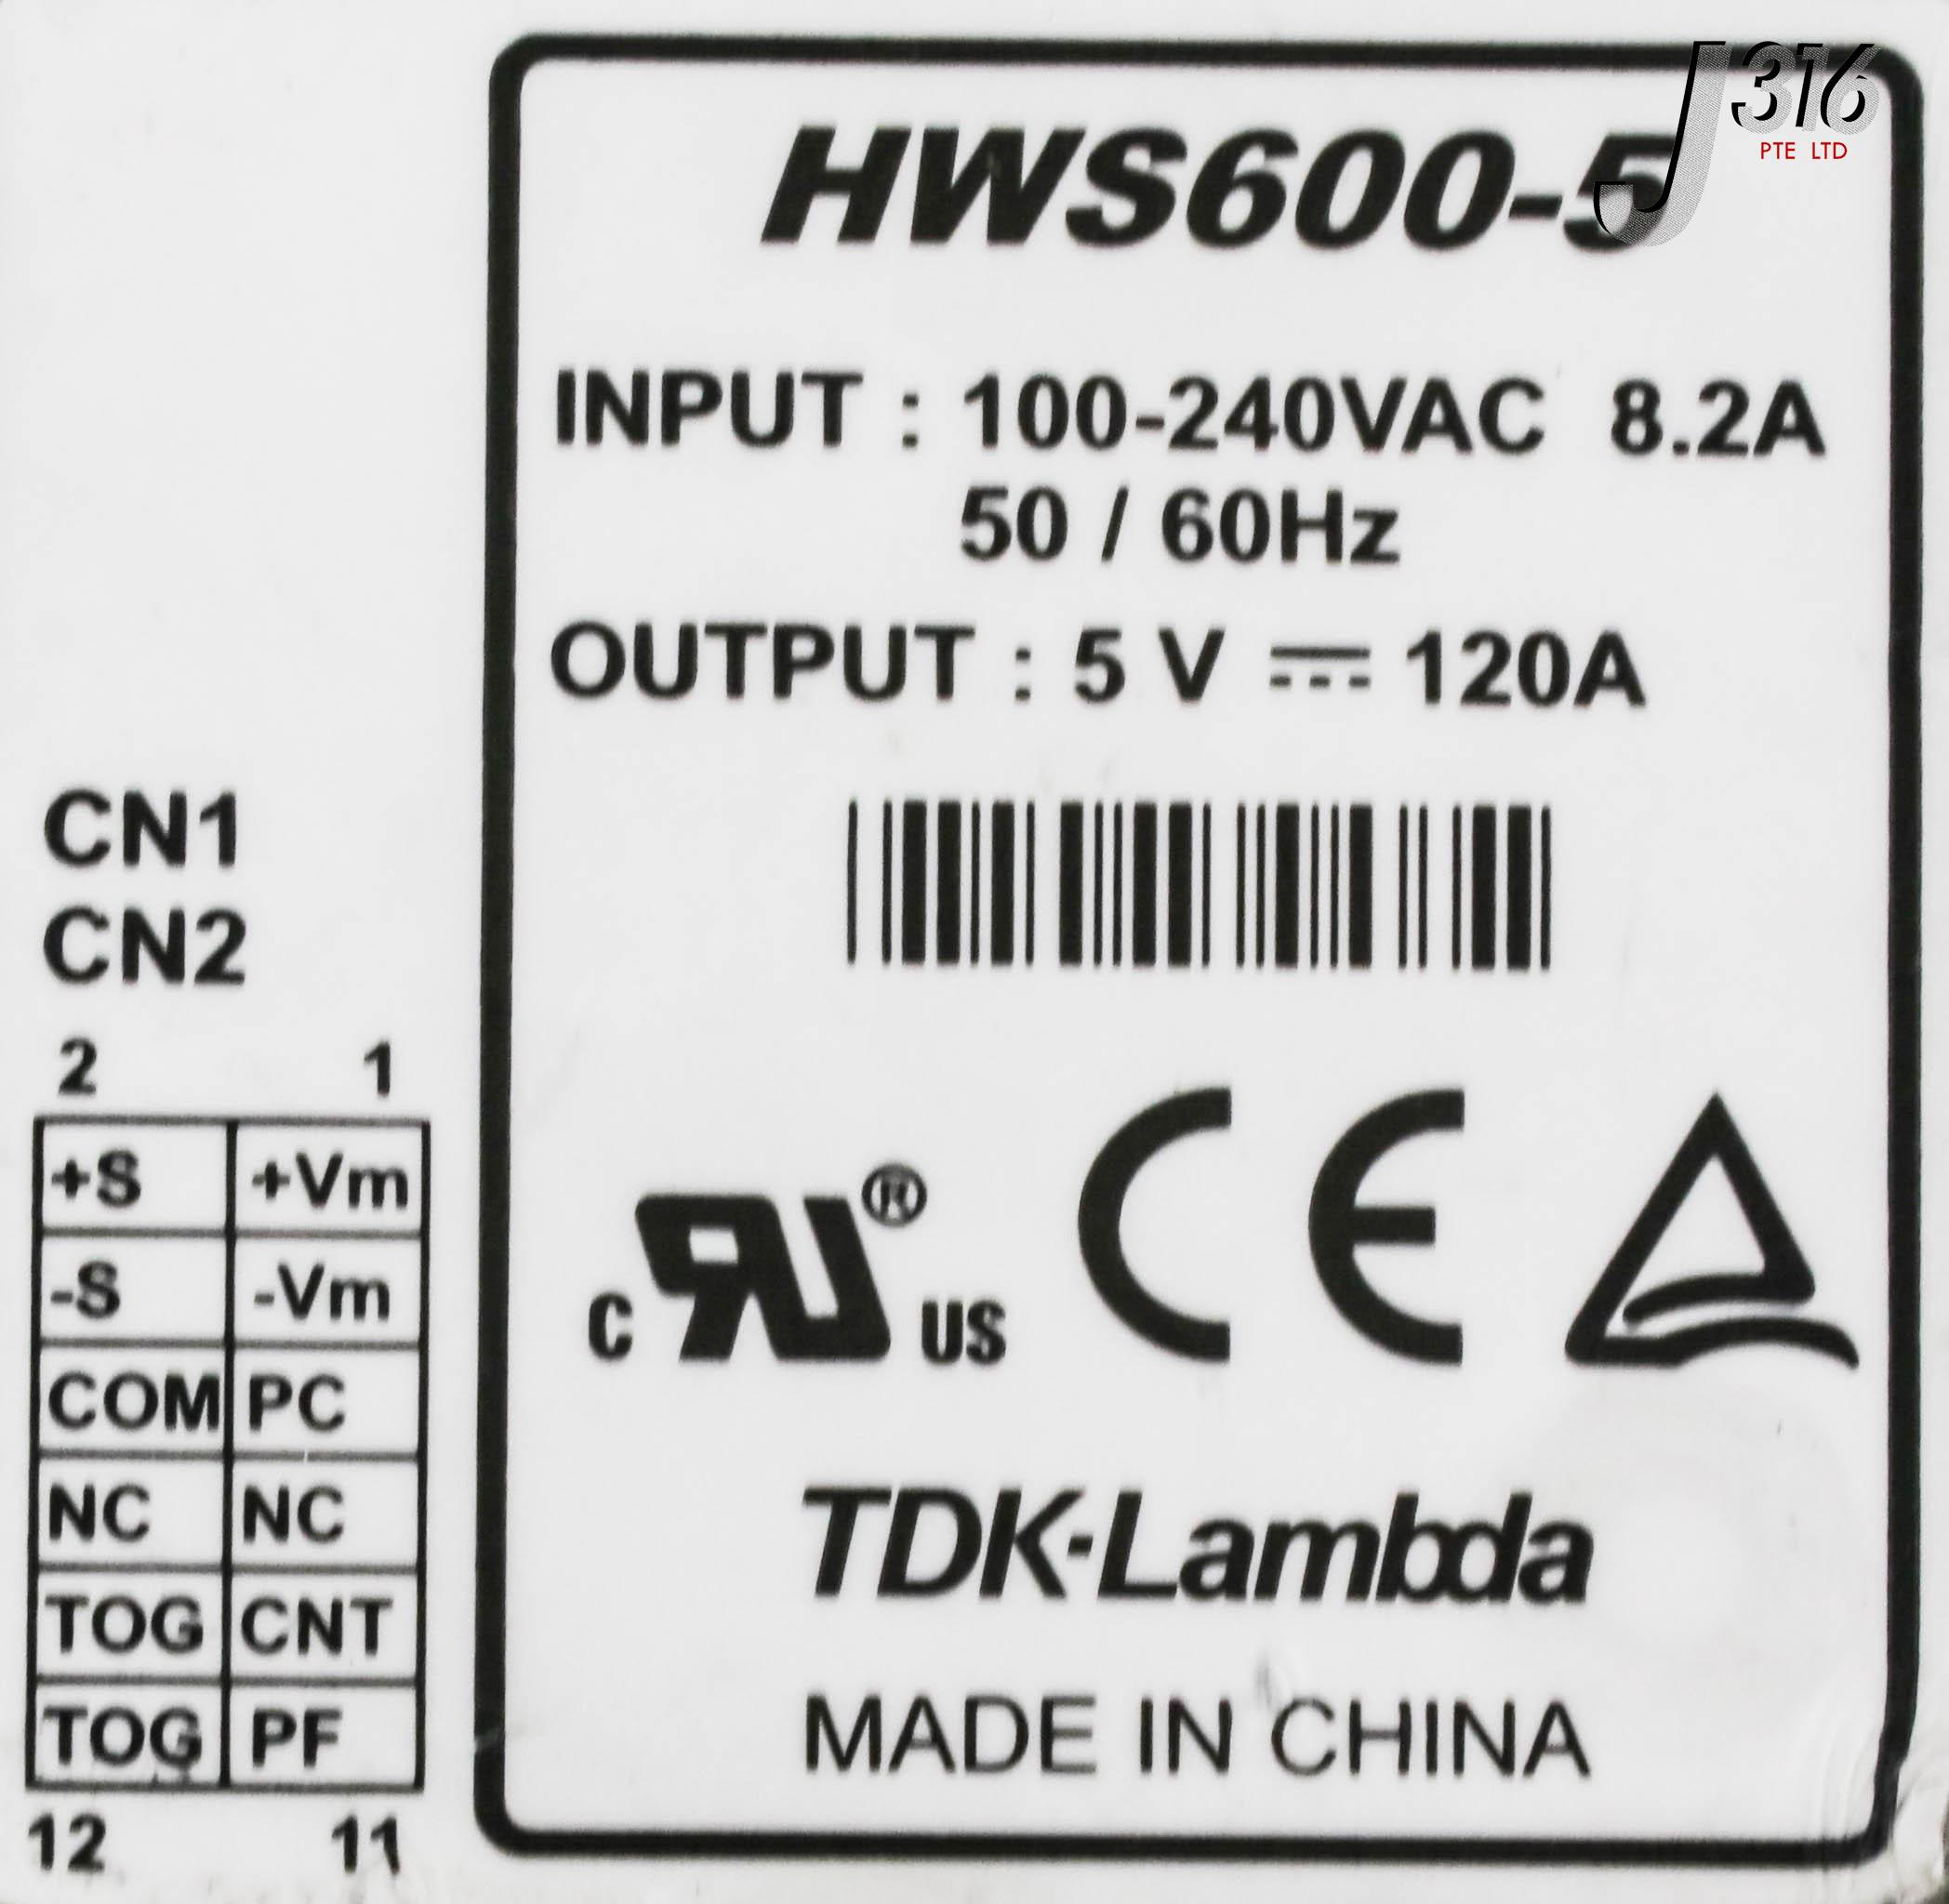 13336 TDK-LAMBDA AC/DC SWITCHING POWER SUPPLY,100-240VAC,8